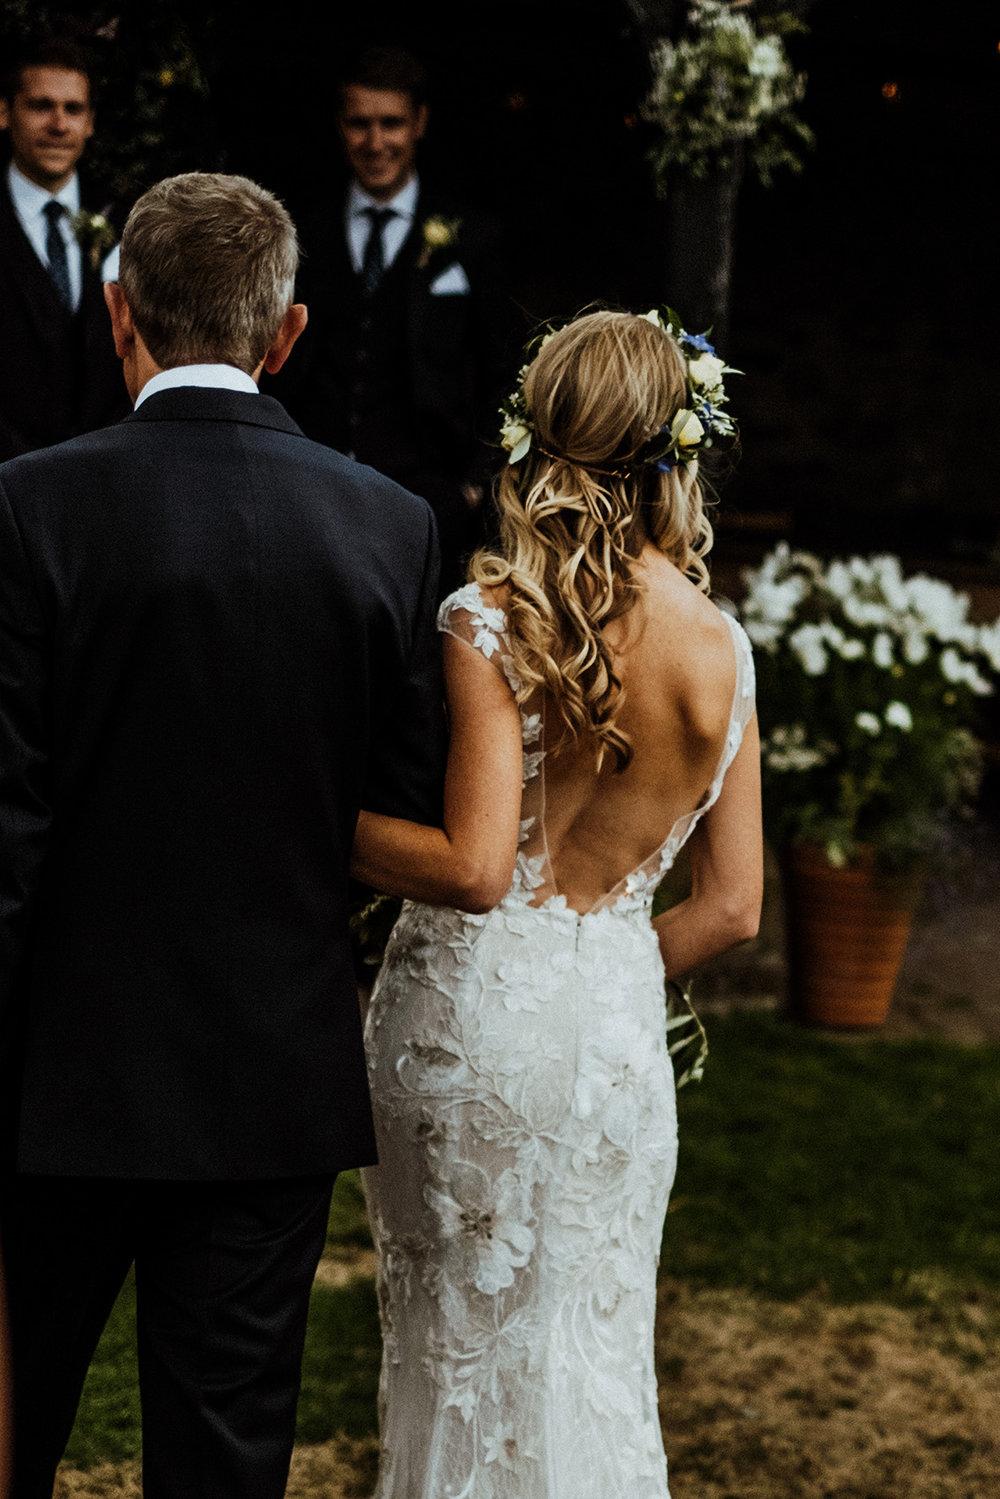 Editorial-wedding-photographer-kent-2.jpg